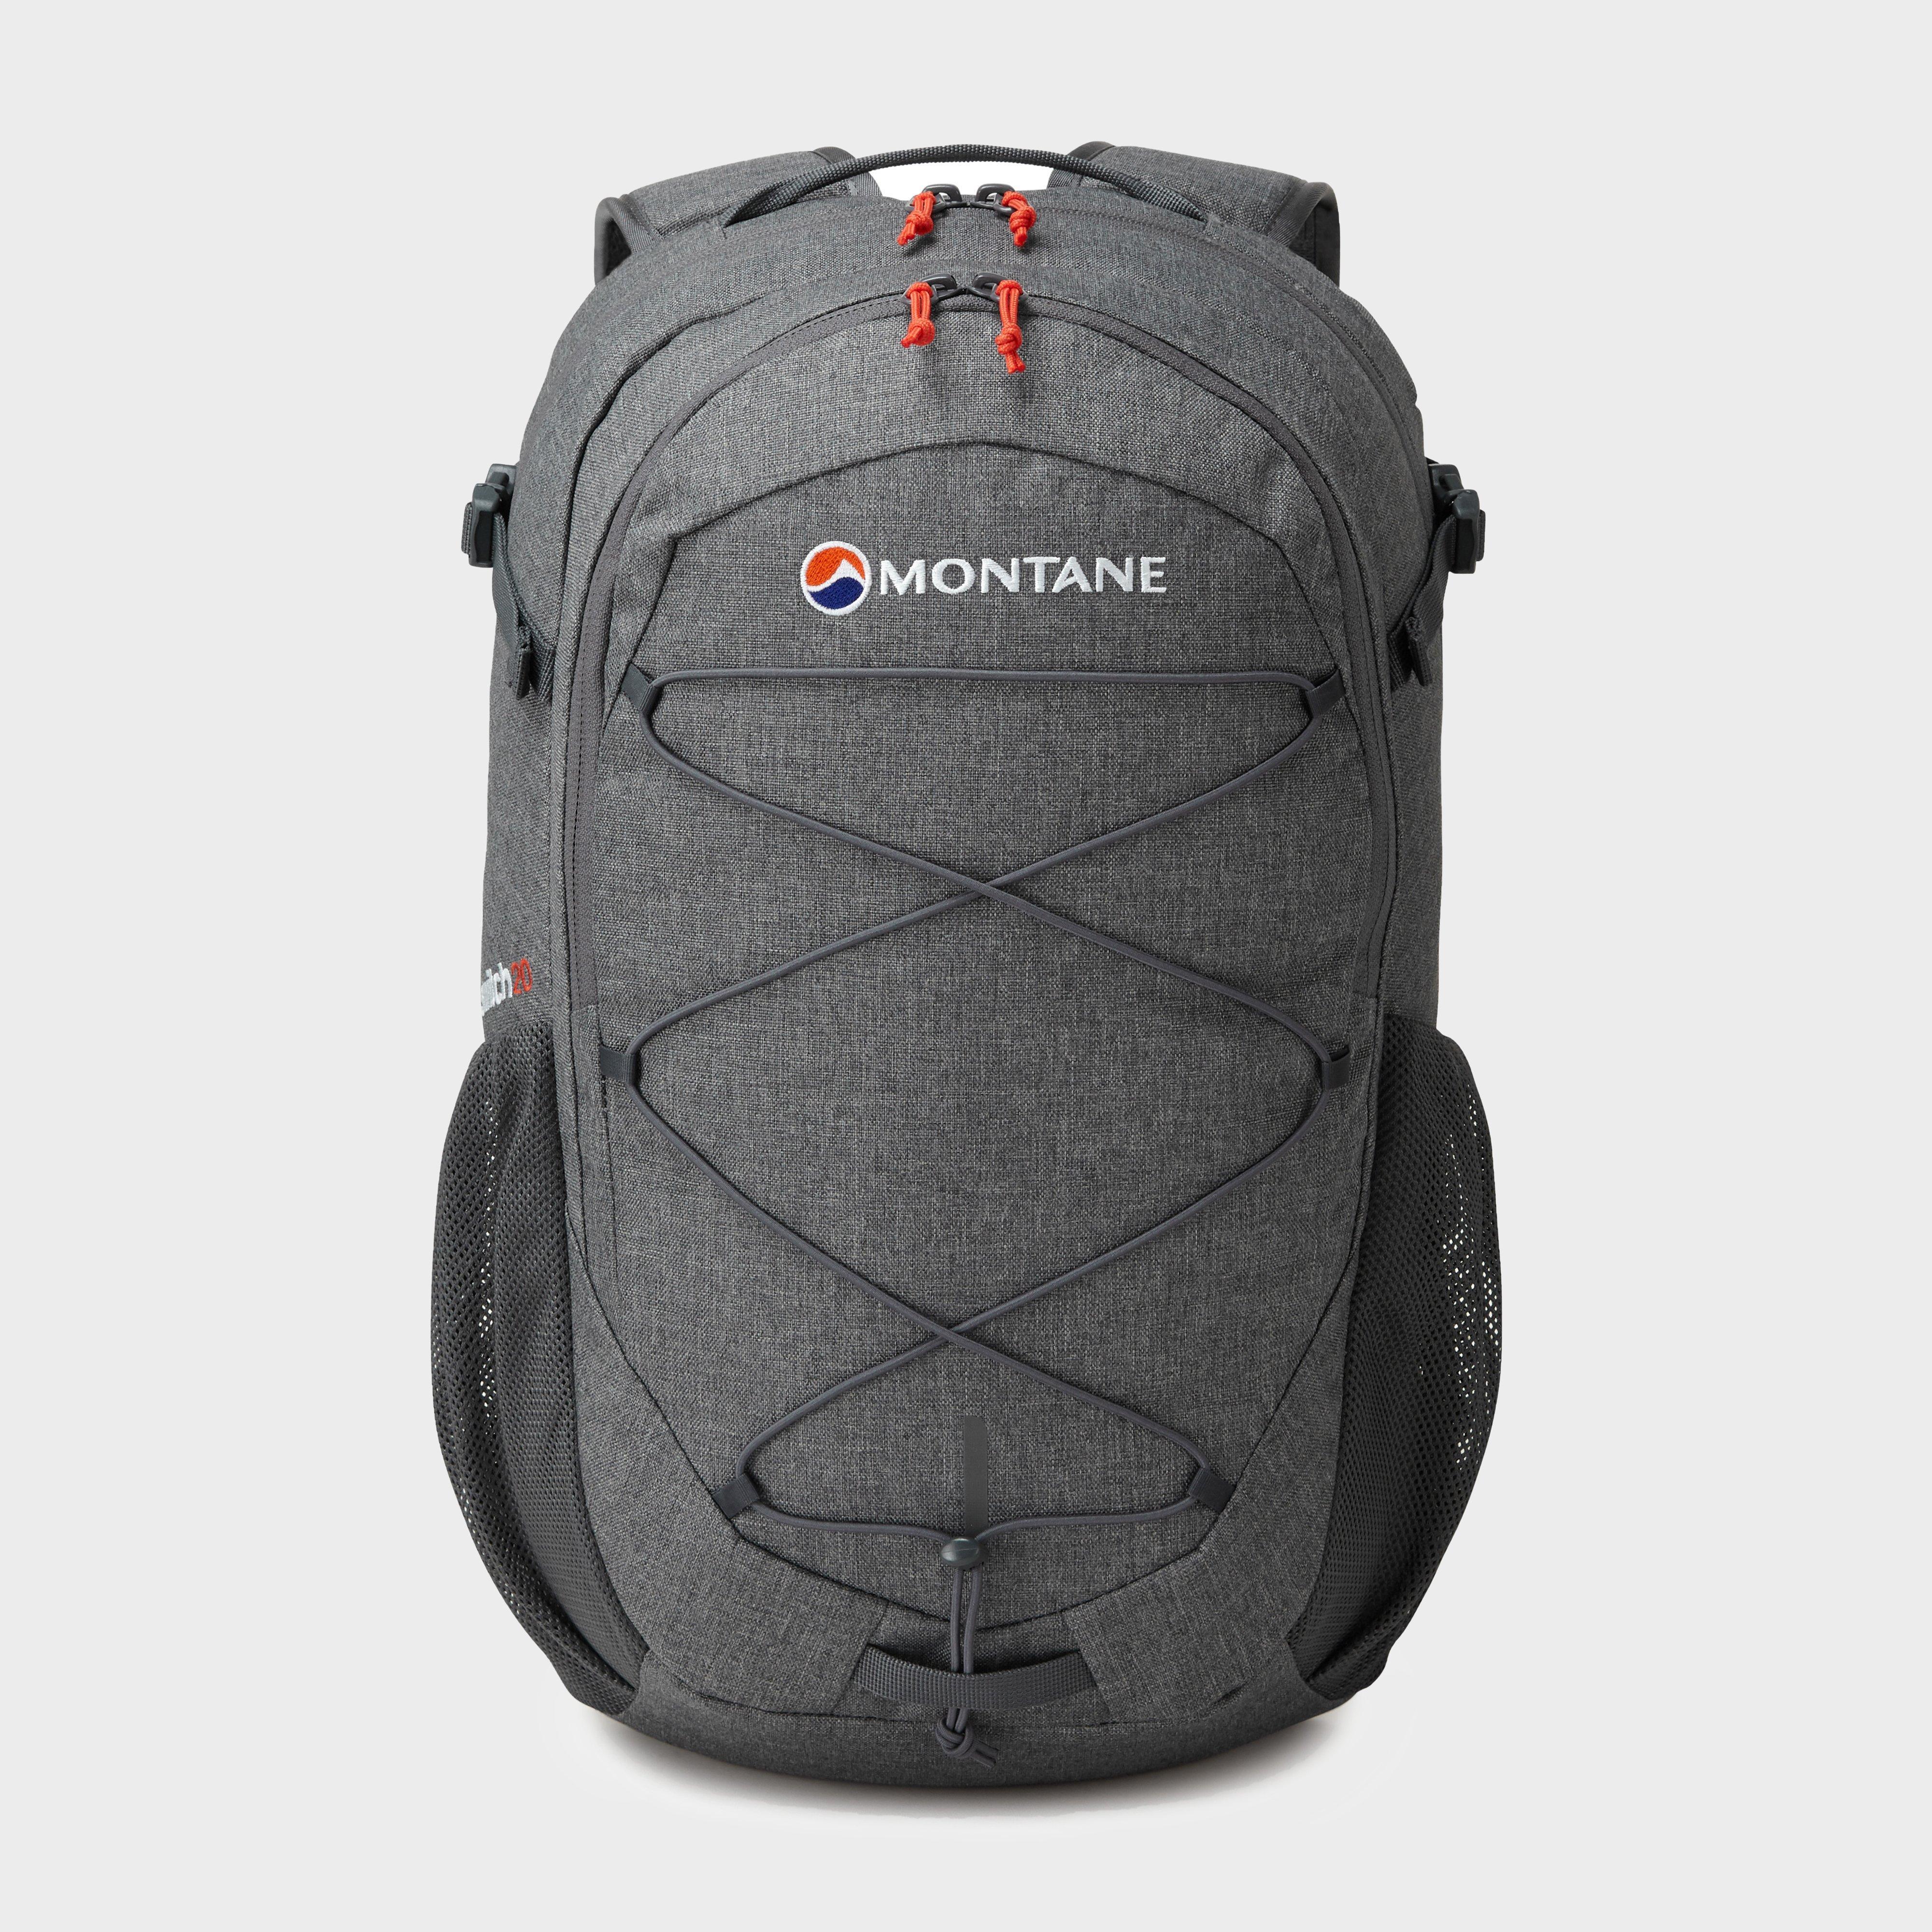 Montane Switch 20 Daypack, Grey